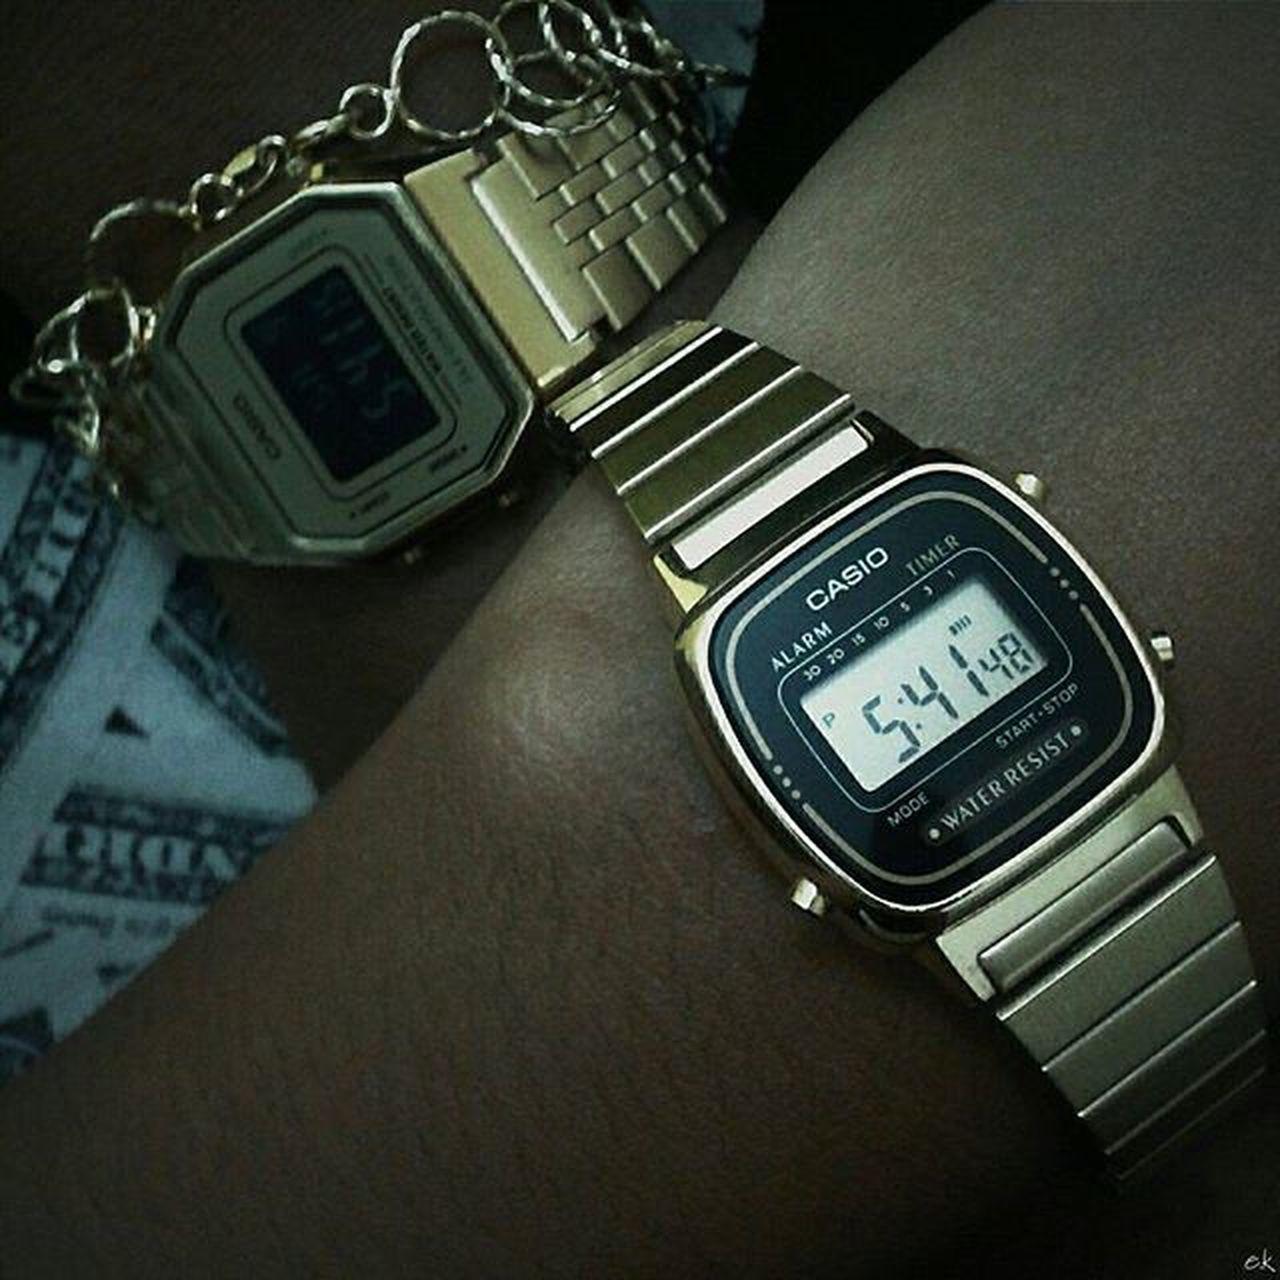 Gold Watch Casio Gold 011 Dotedefotografia Instapicten StyleBR Dollar Streetstyle Thevisualsbrasil DOPE Edition Ootd SP BR Urban City Vscourban Vscobrasil VSCO Vscocasio Vscoootd Vscofashion Vscogold Vscoamadores_ vscofotografia_